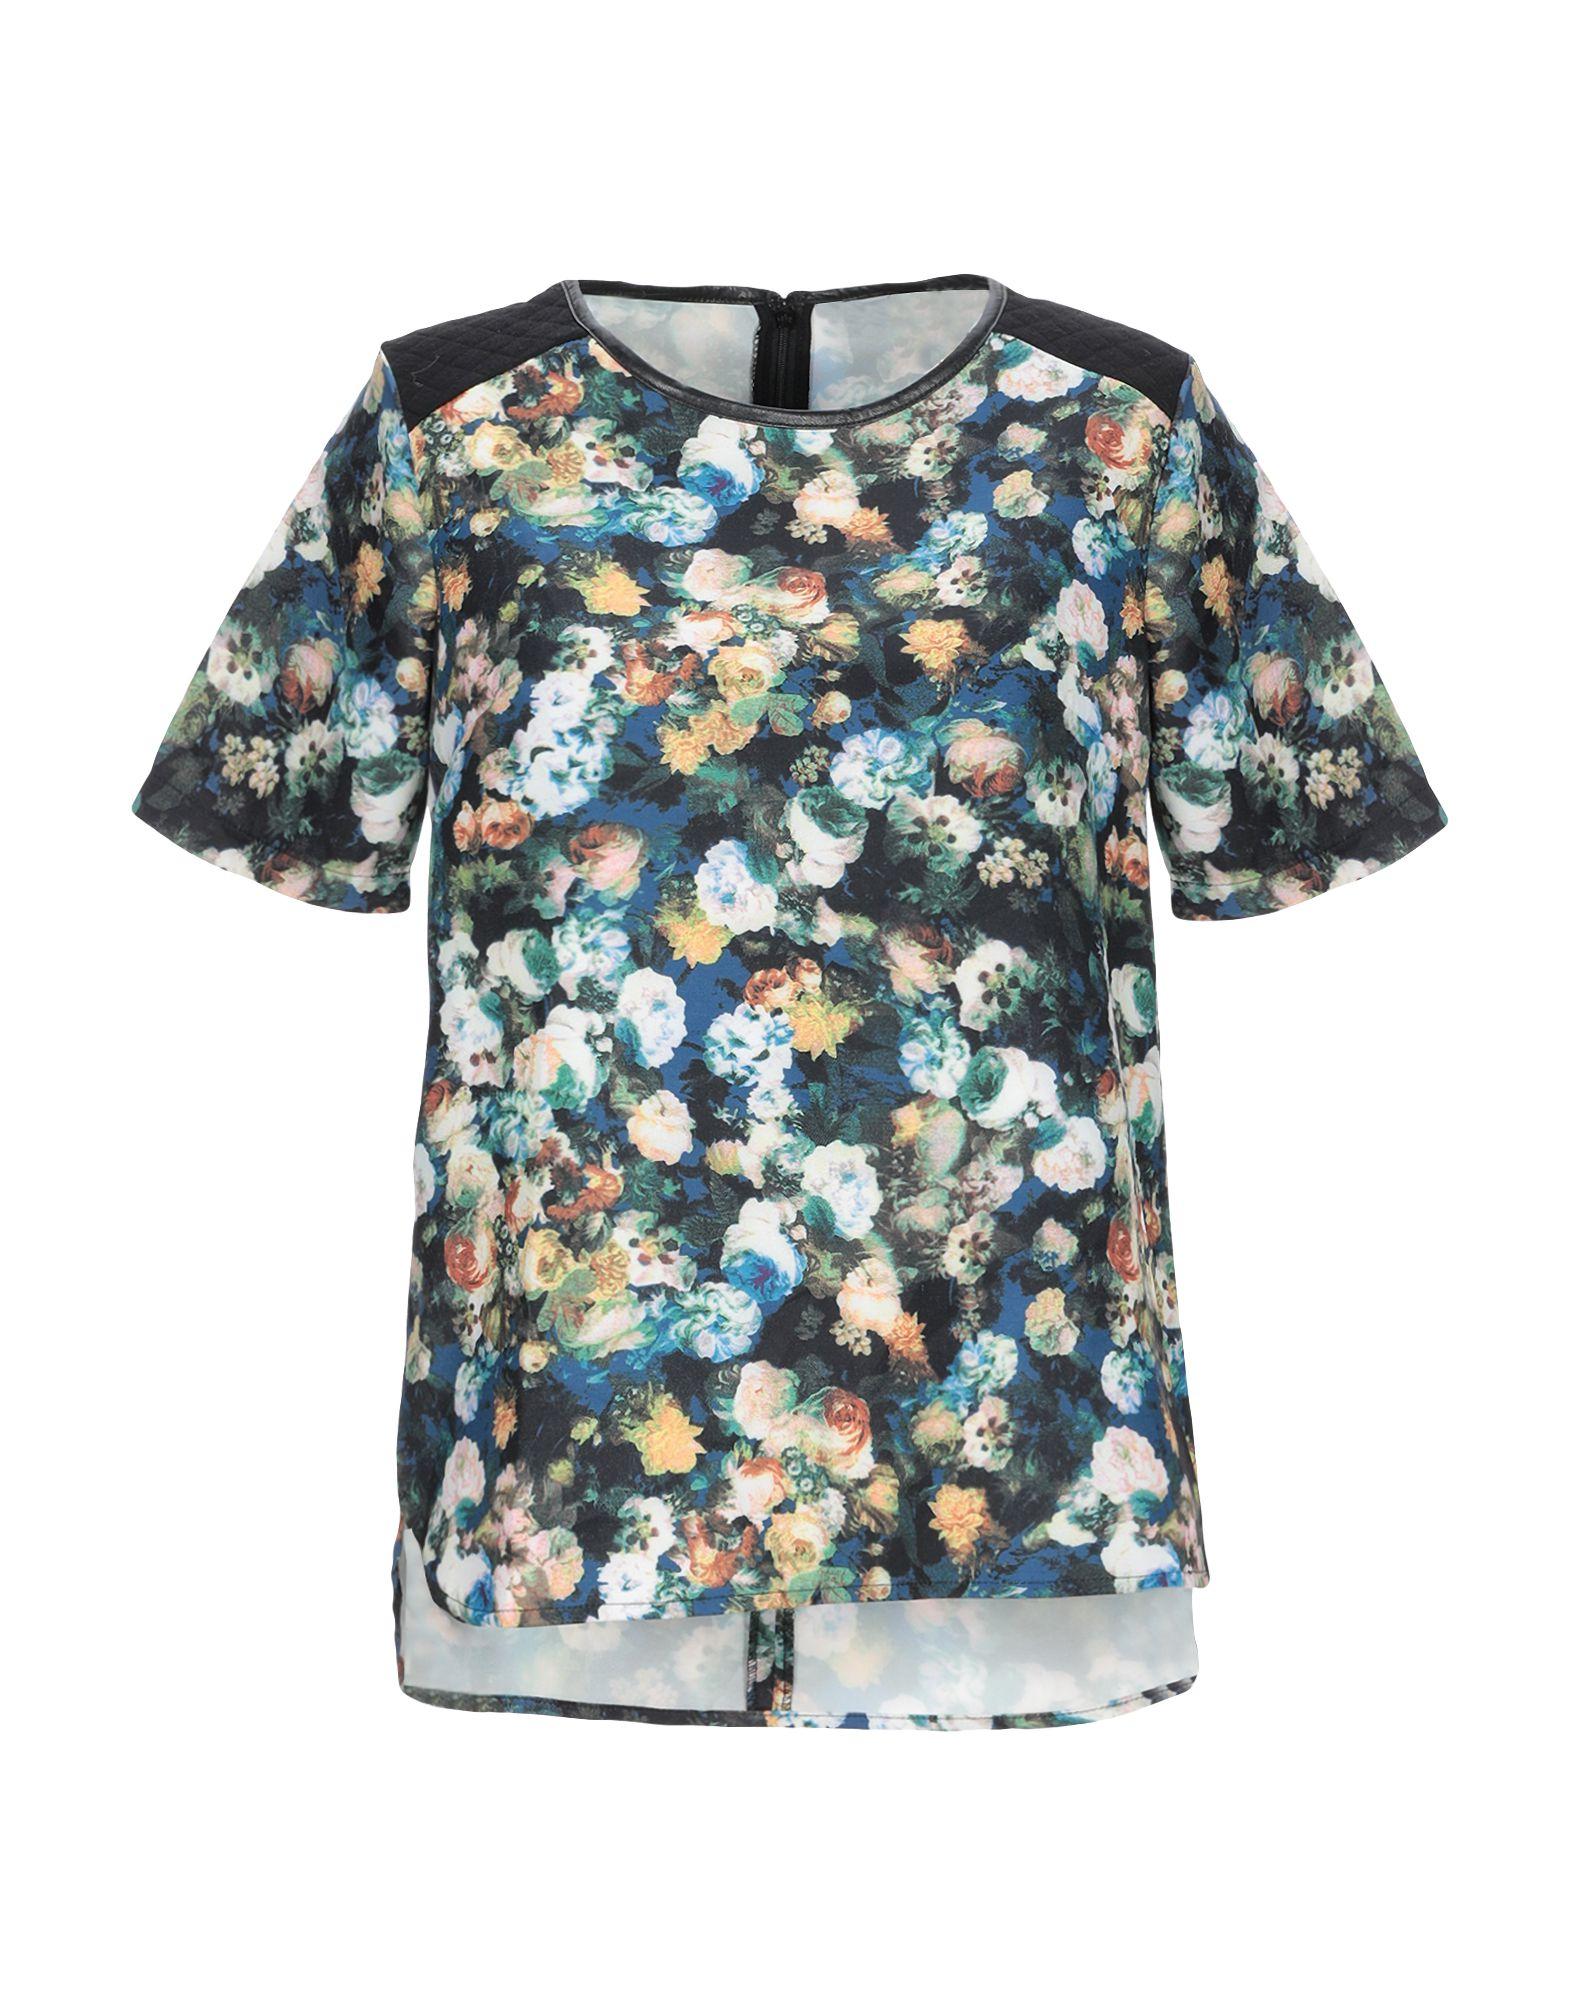 SILVIAN HEACH Блузка блузка женская silvian heach benifato цвет черный синий pga18120bl black navy размер l 46